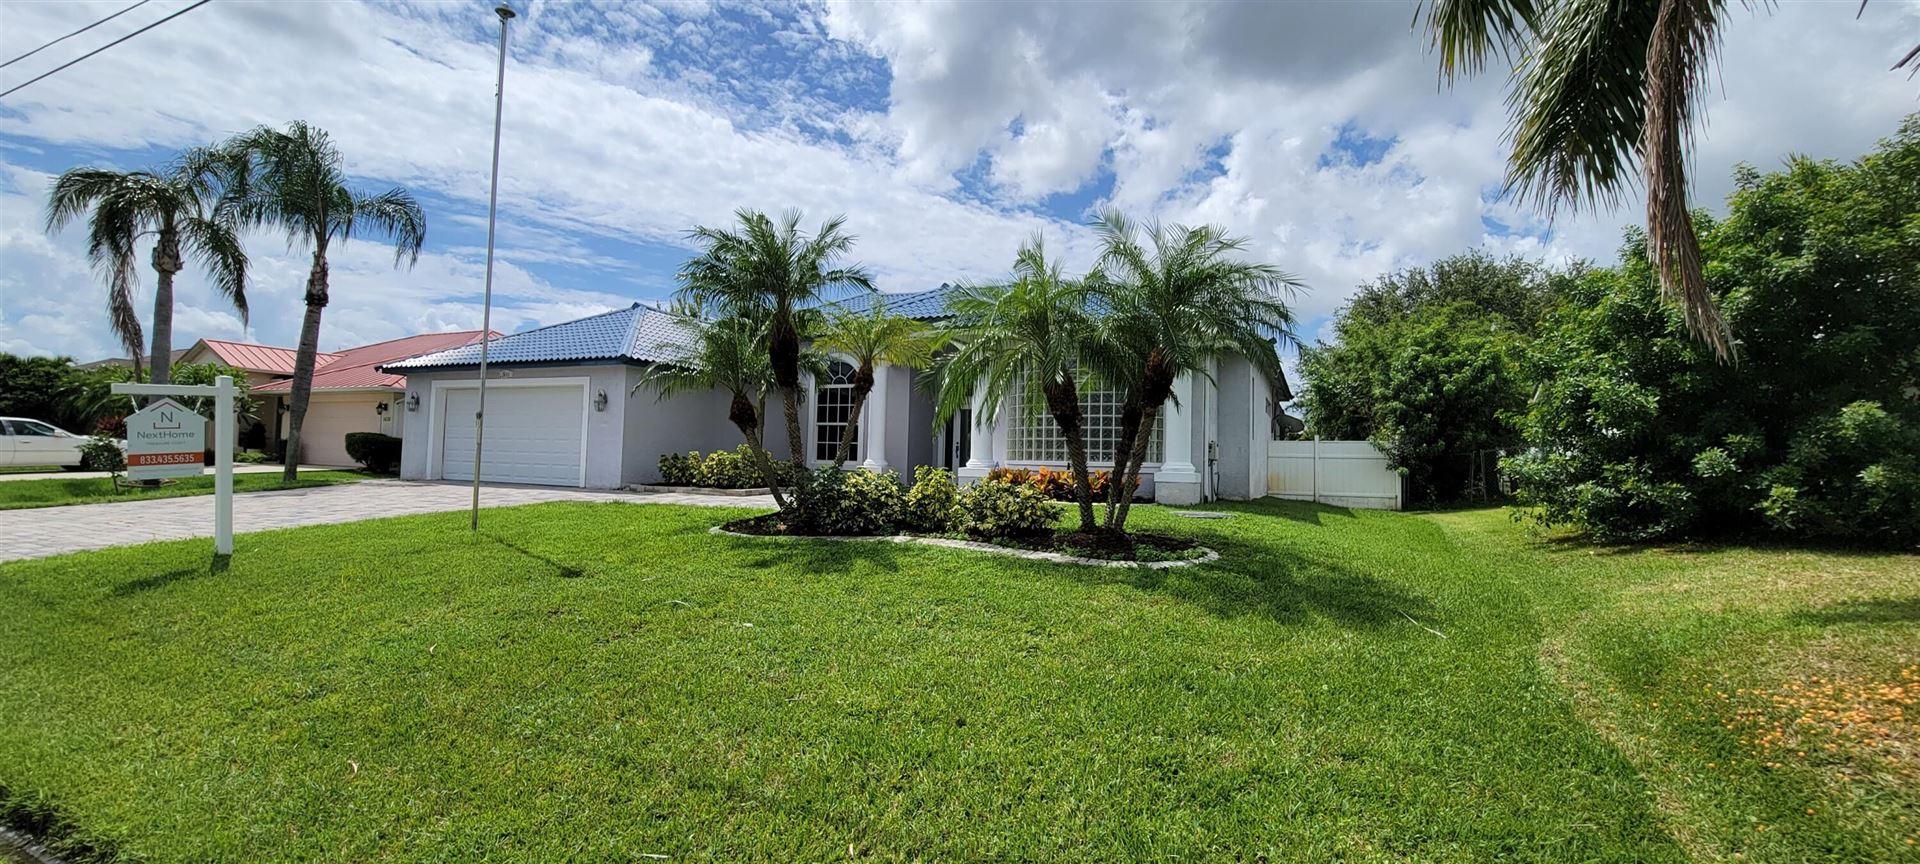 Photo of 2644 SW Acacia Avenue, Port Saint Lucie, FL 34987 (MLS # RX-10736299)